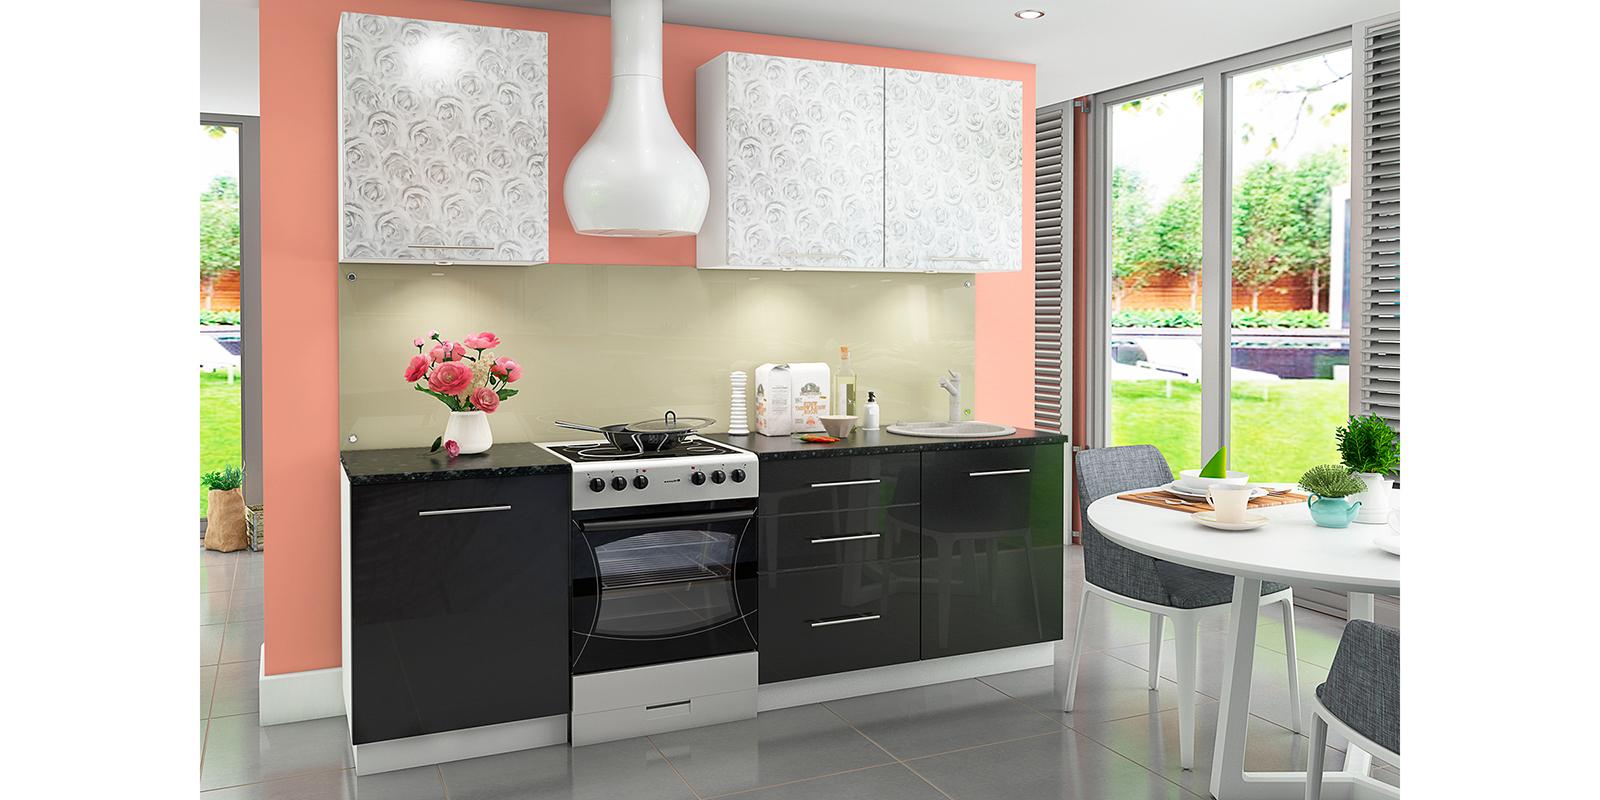 Кухонный гарнитур Чикаго 240 см (белый/азалия/антрацит)